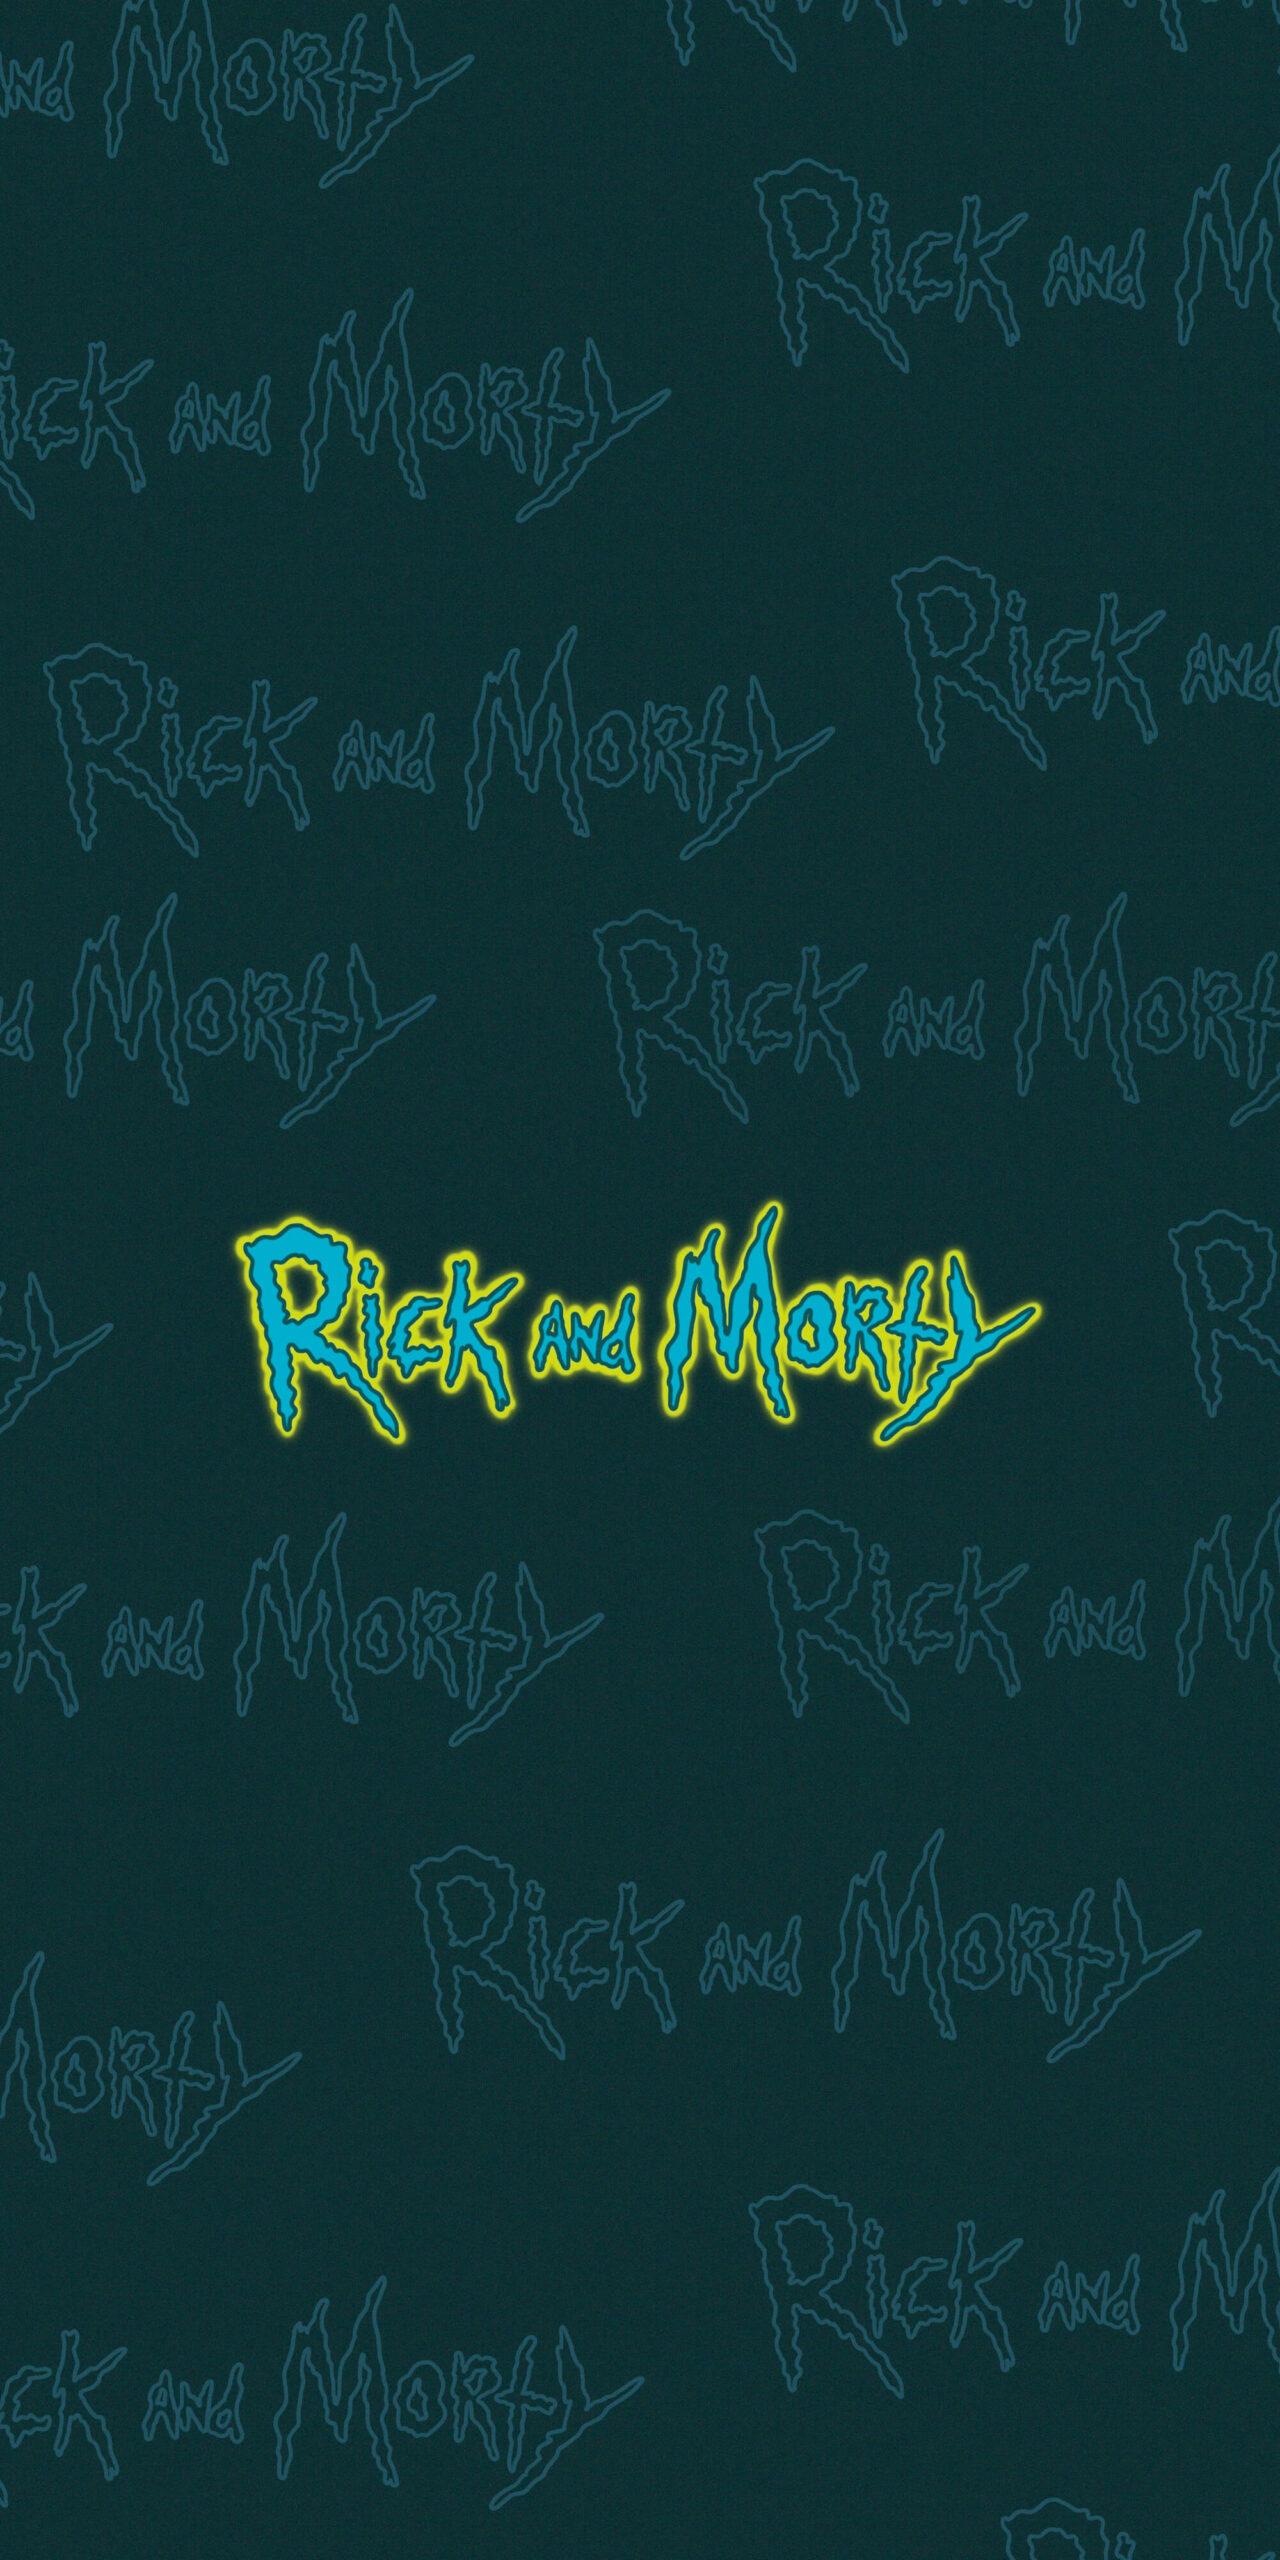 rick and morty logo blue wallpaper